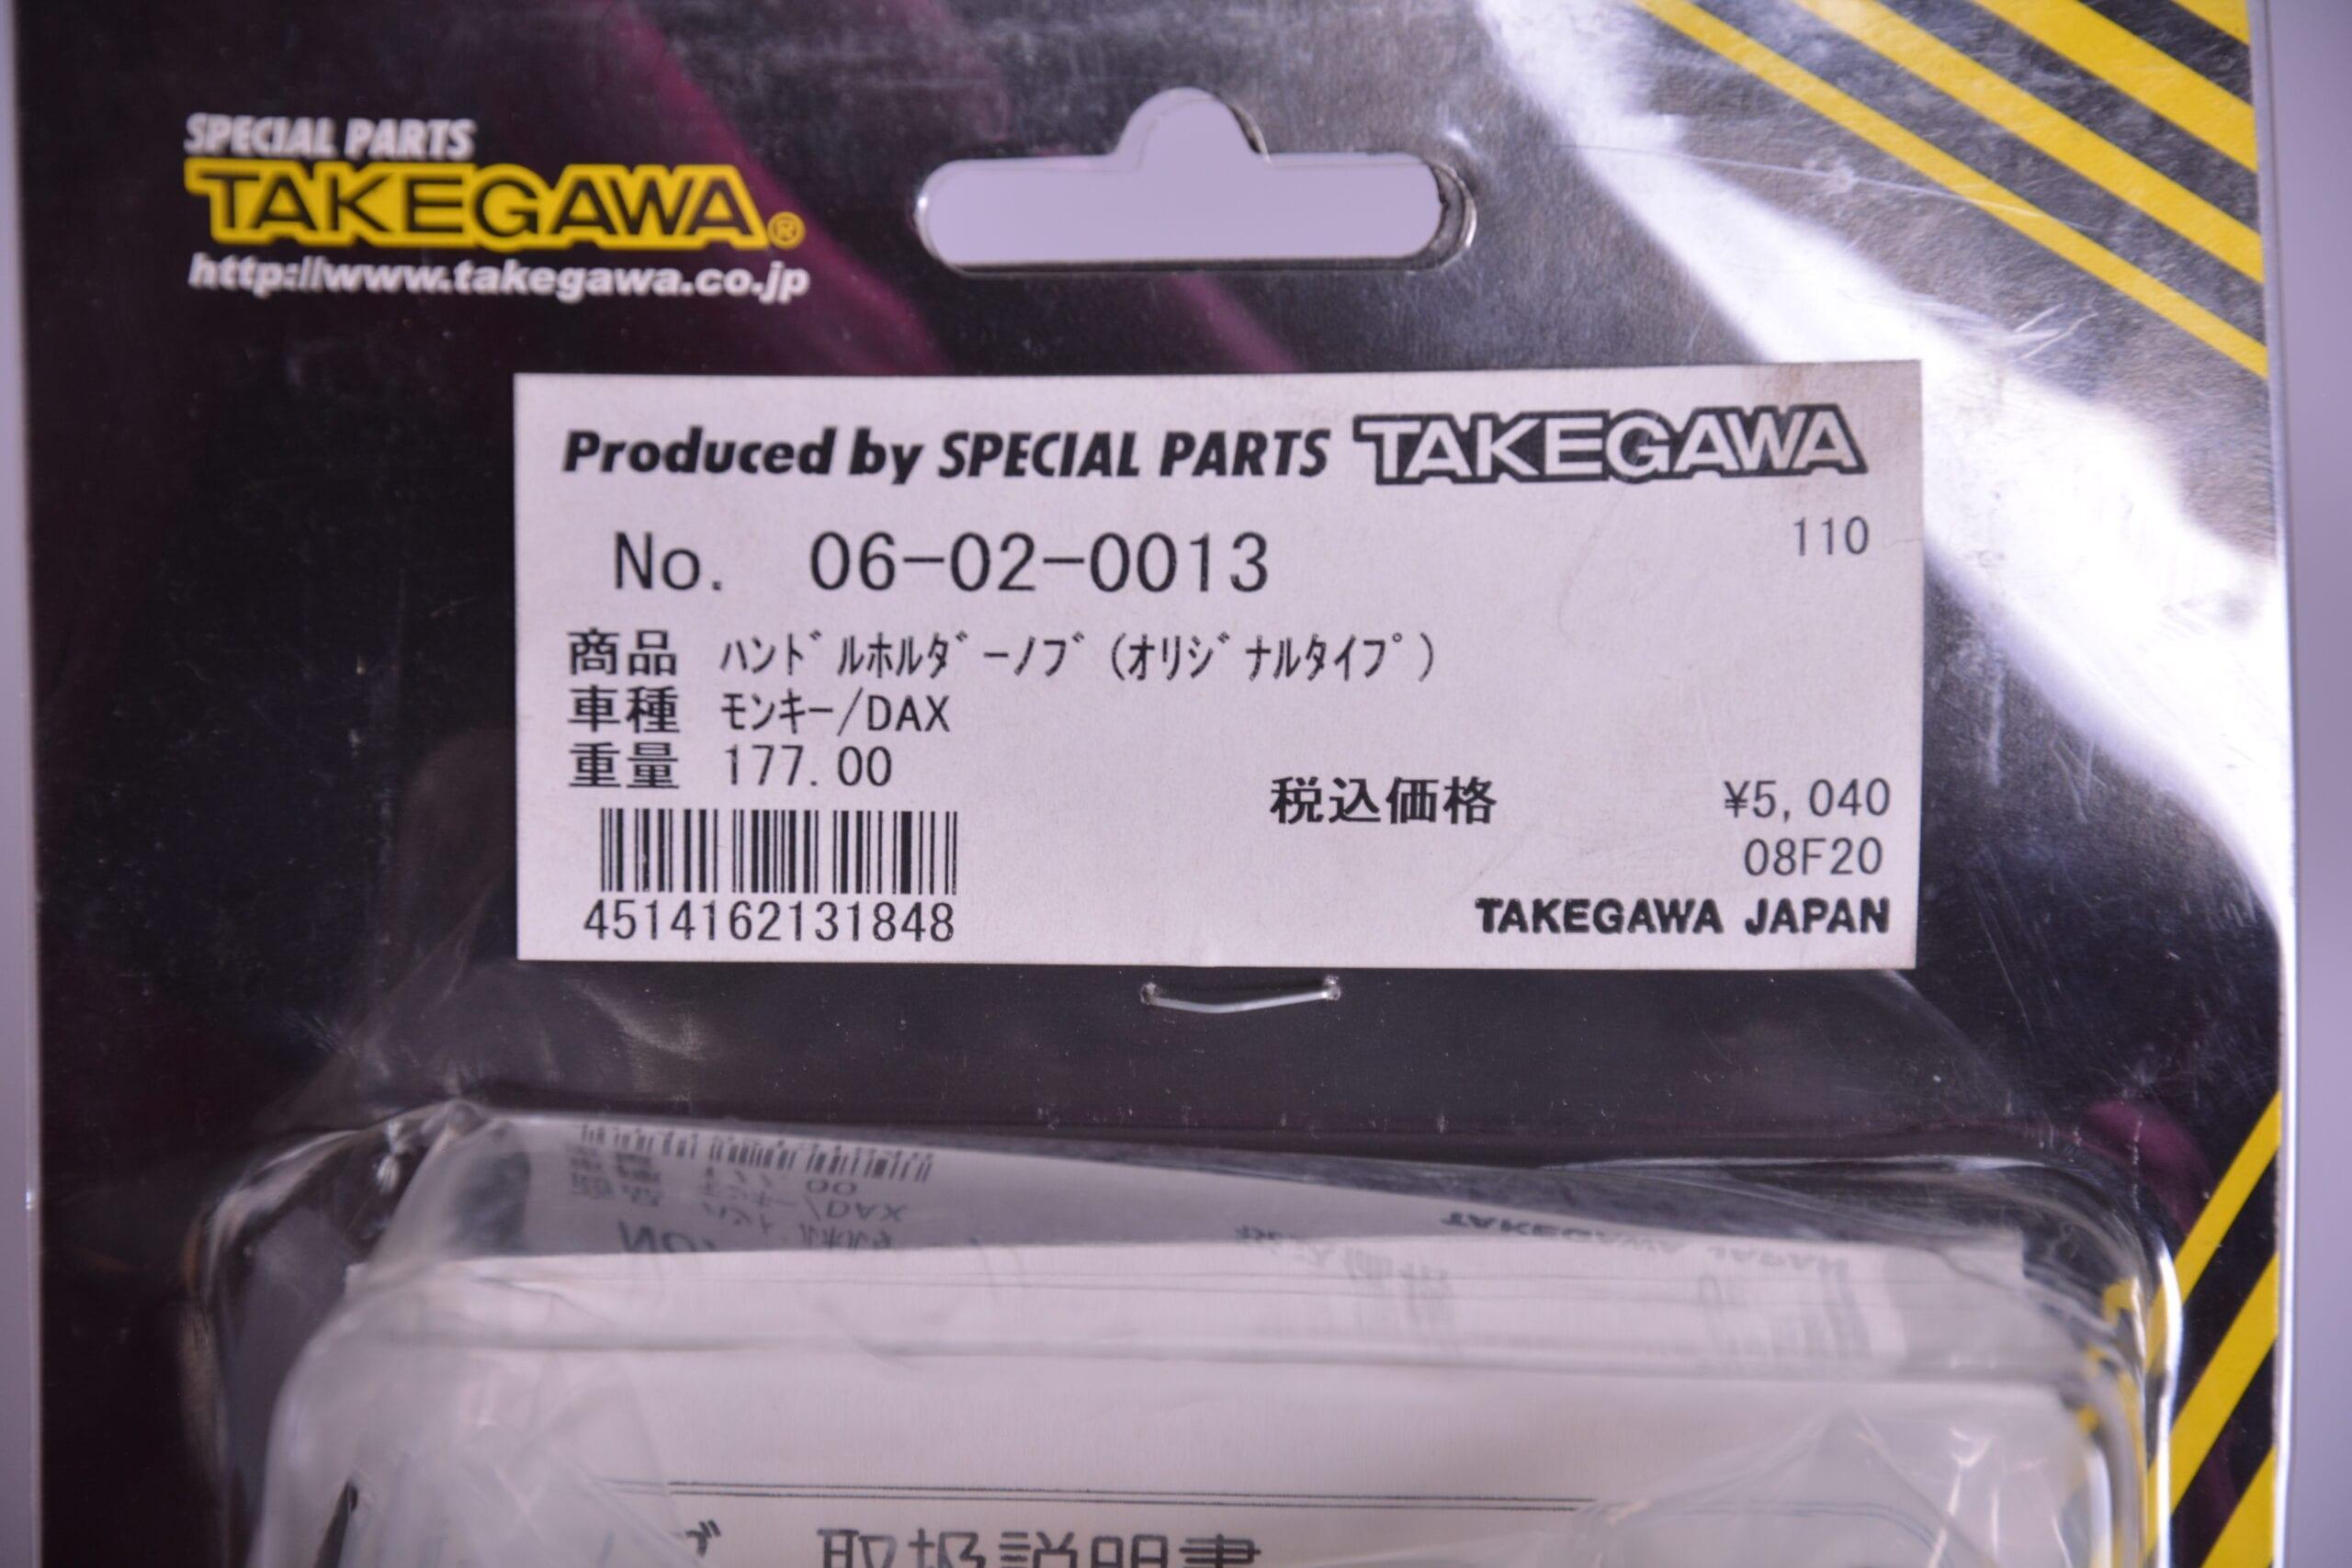 Handle holder knob Takegawa - 06-02-0013